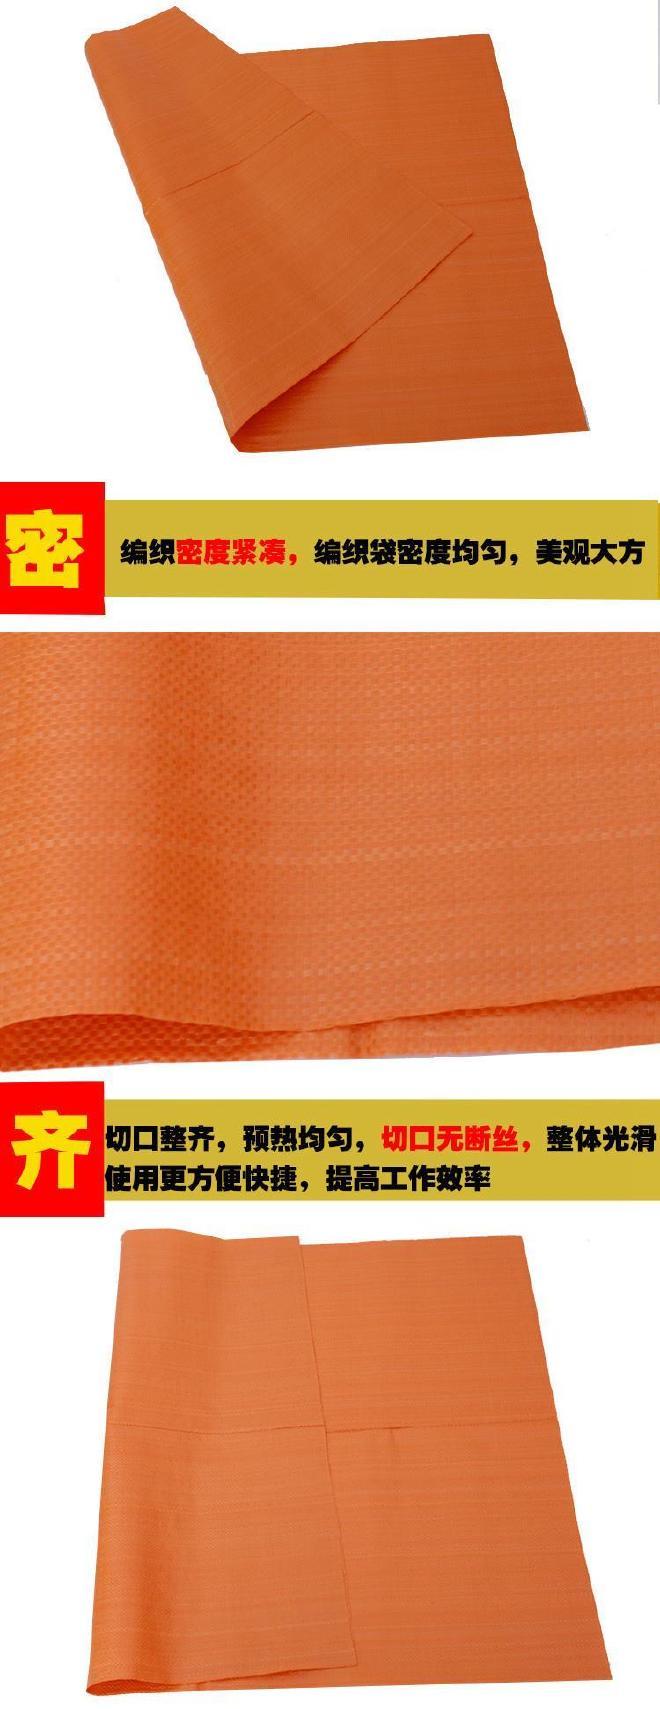 加厚�Z食��袋批�l60*110新料透明�S色�Z食袋目光冰冷超�Y��100斤包�b袋示例�D9